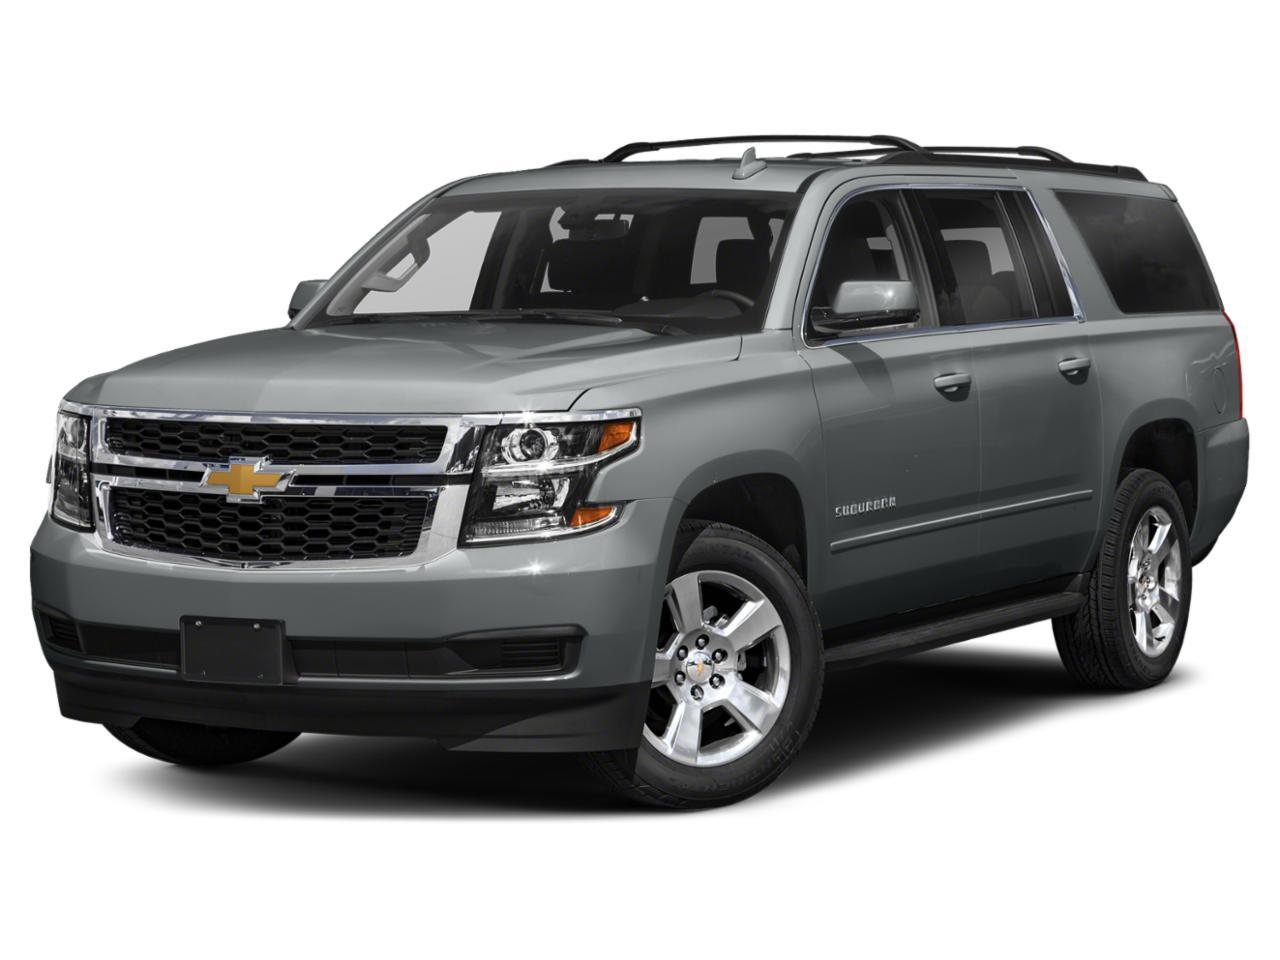 Steel Metallic 2020 Chevrolet Suburban LT SUV Lexington NC